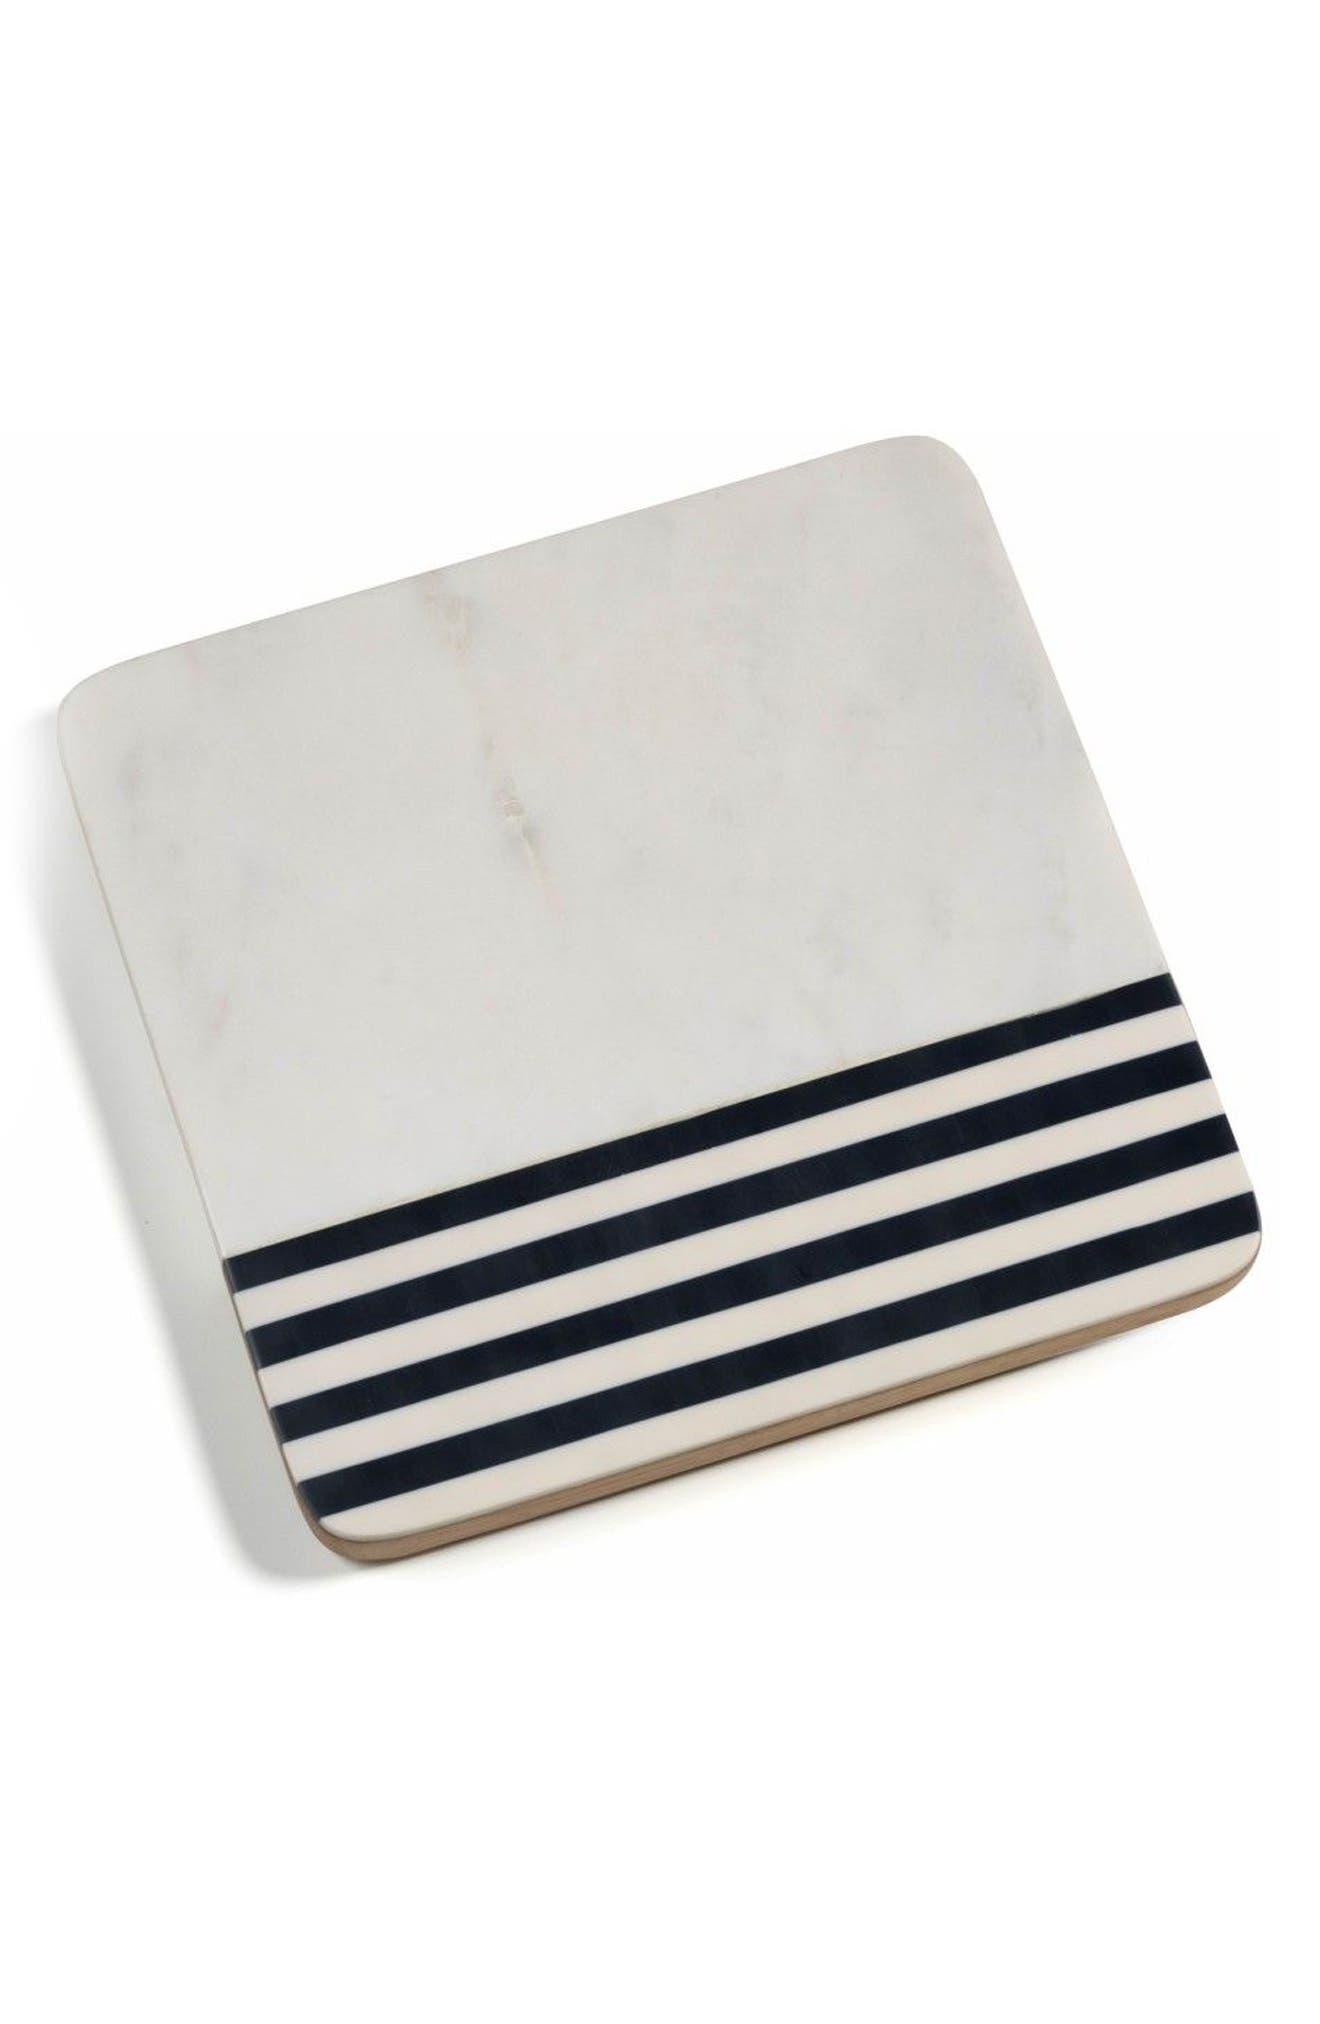 Marine Marble & Wood Cheese Board,                         Main,                         color, 100